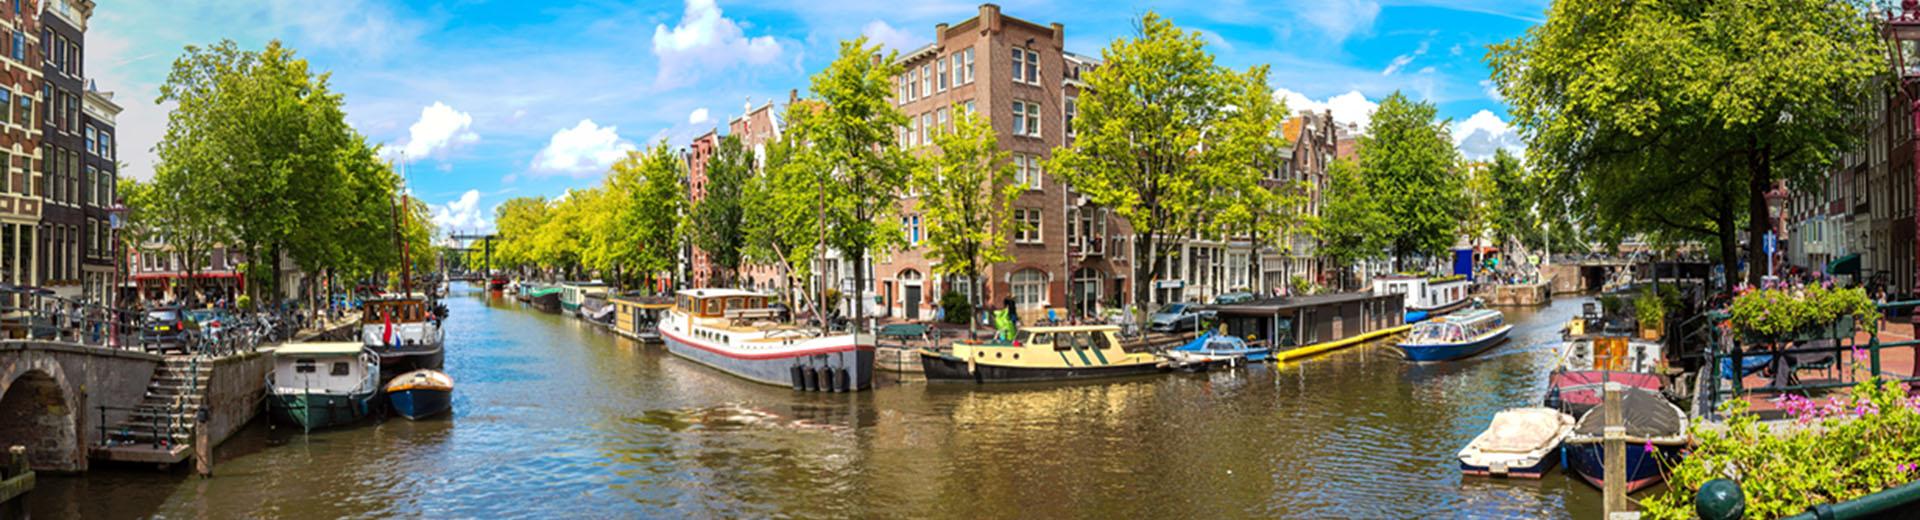 Voyage en groupe Amsterdam - offre confort vol